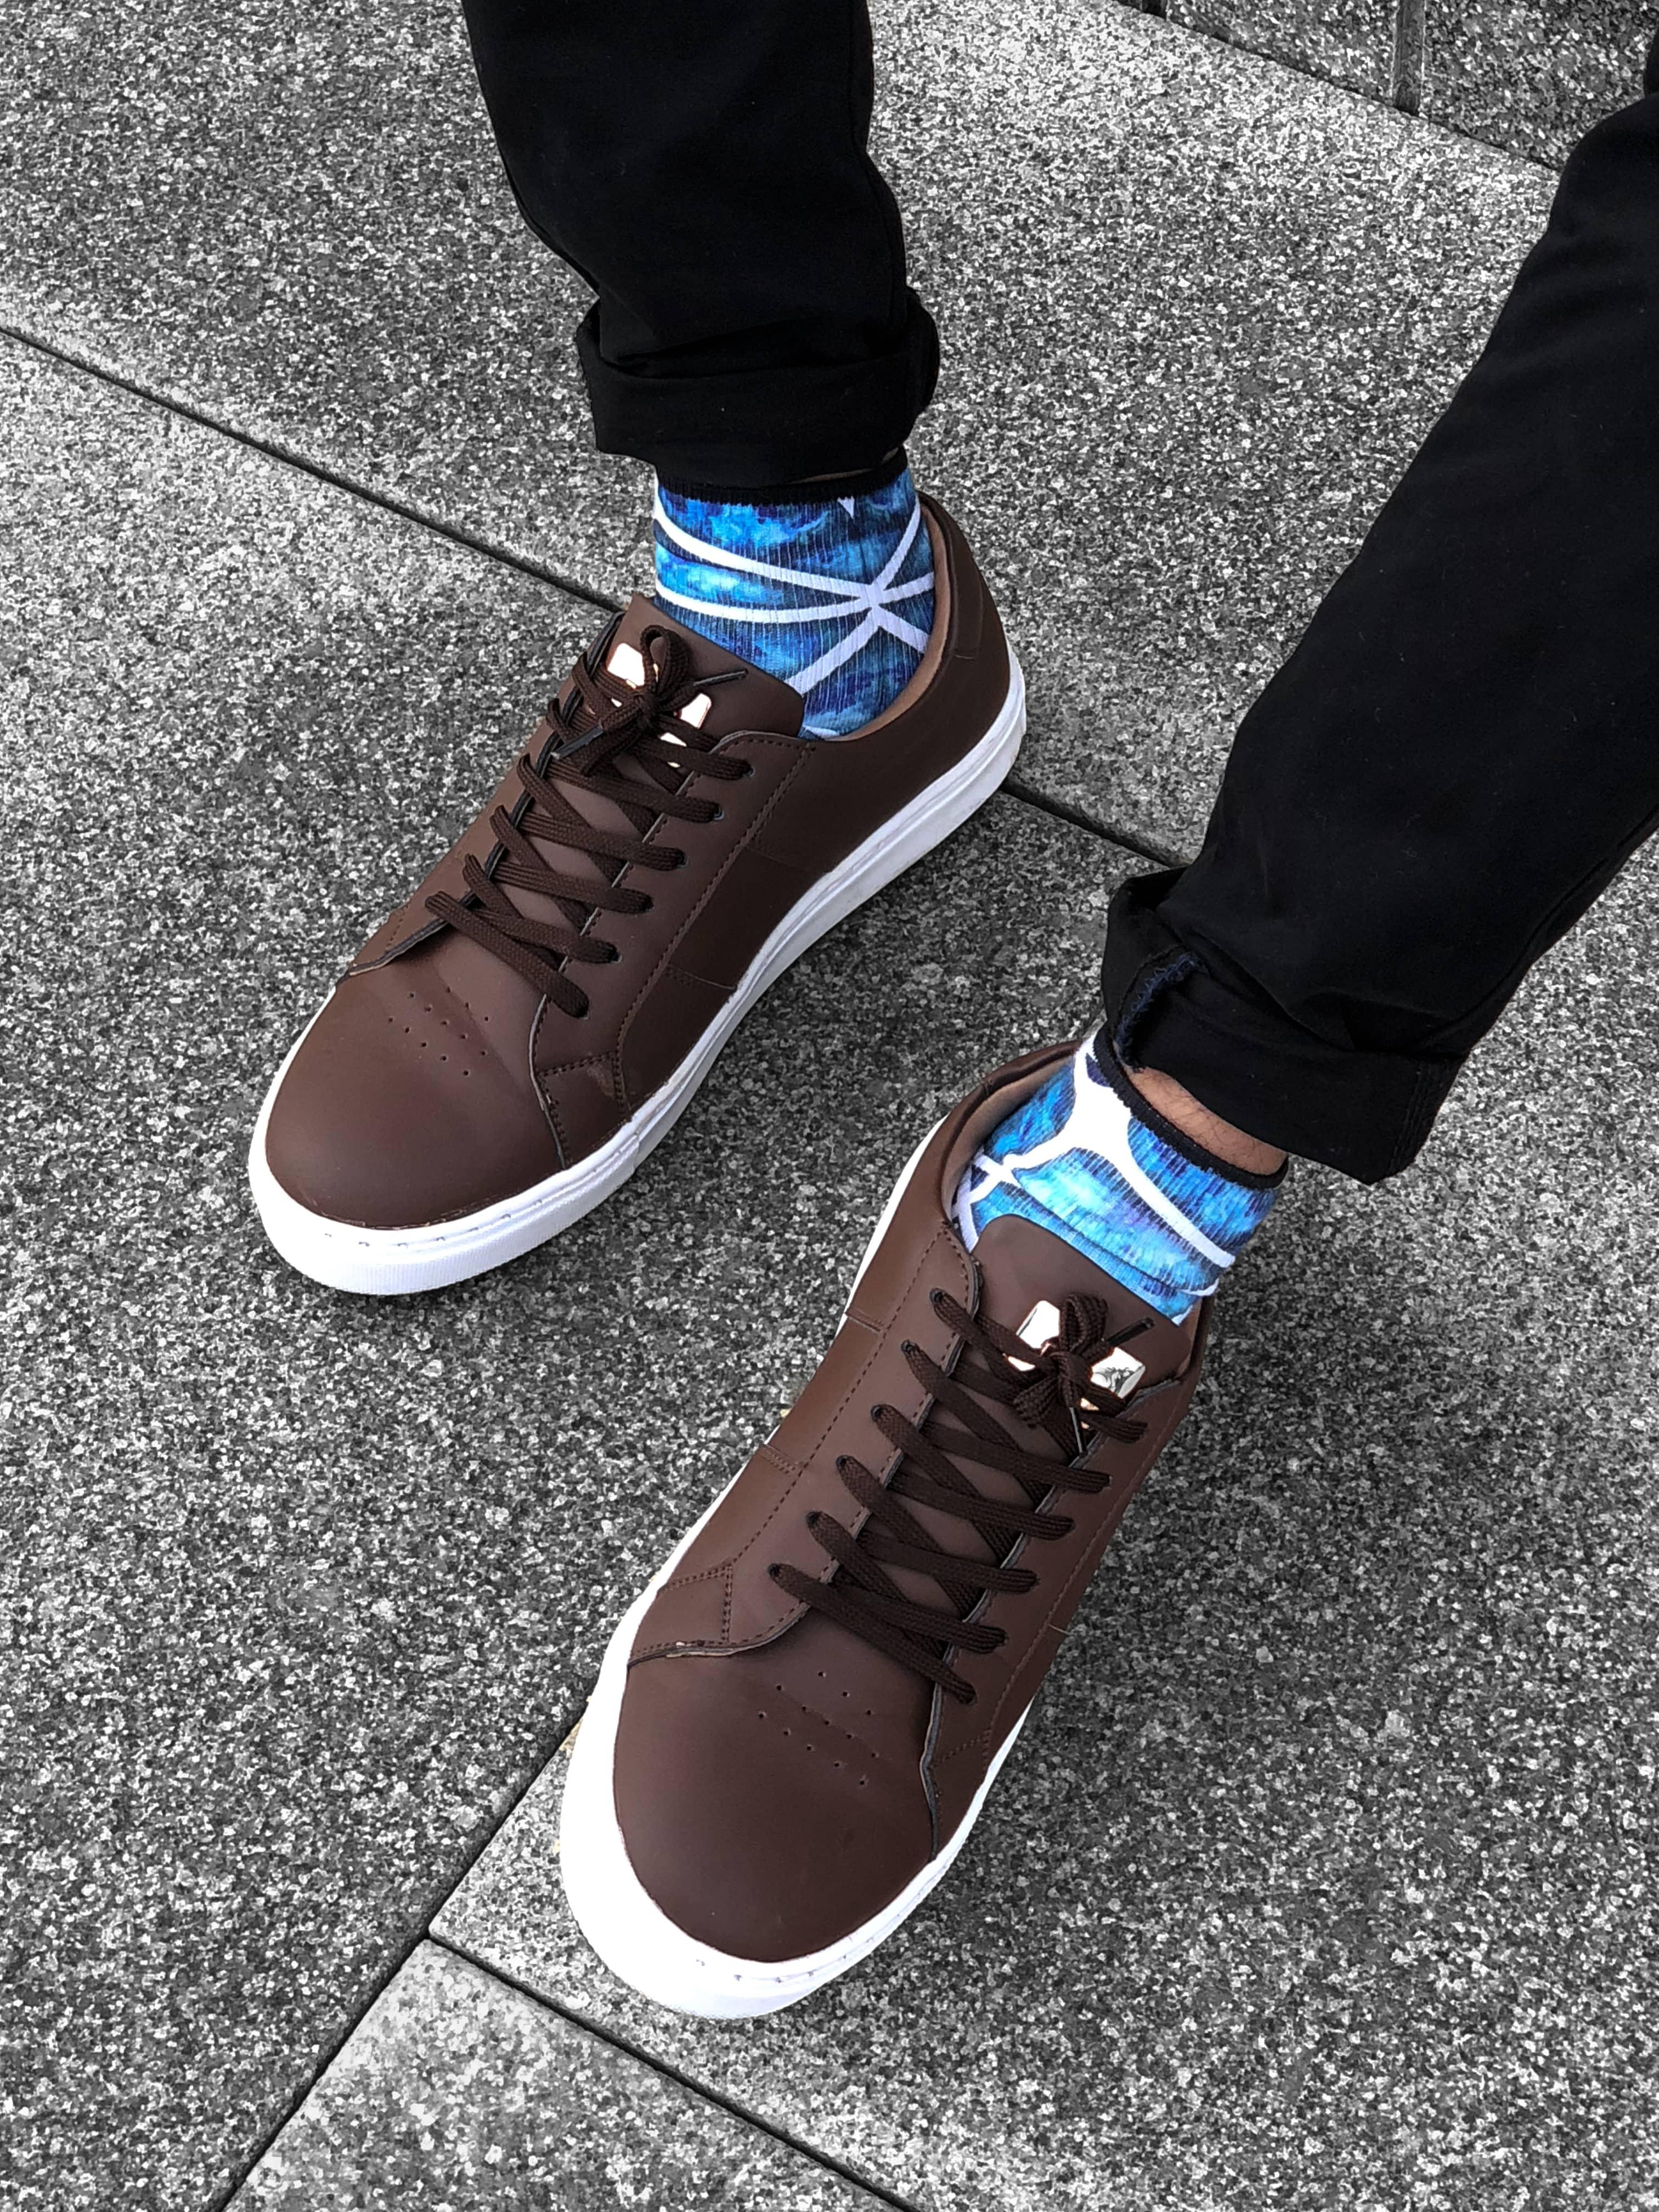 Dynamocks Aqua Celestia socks for Men & Women.